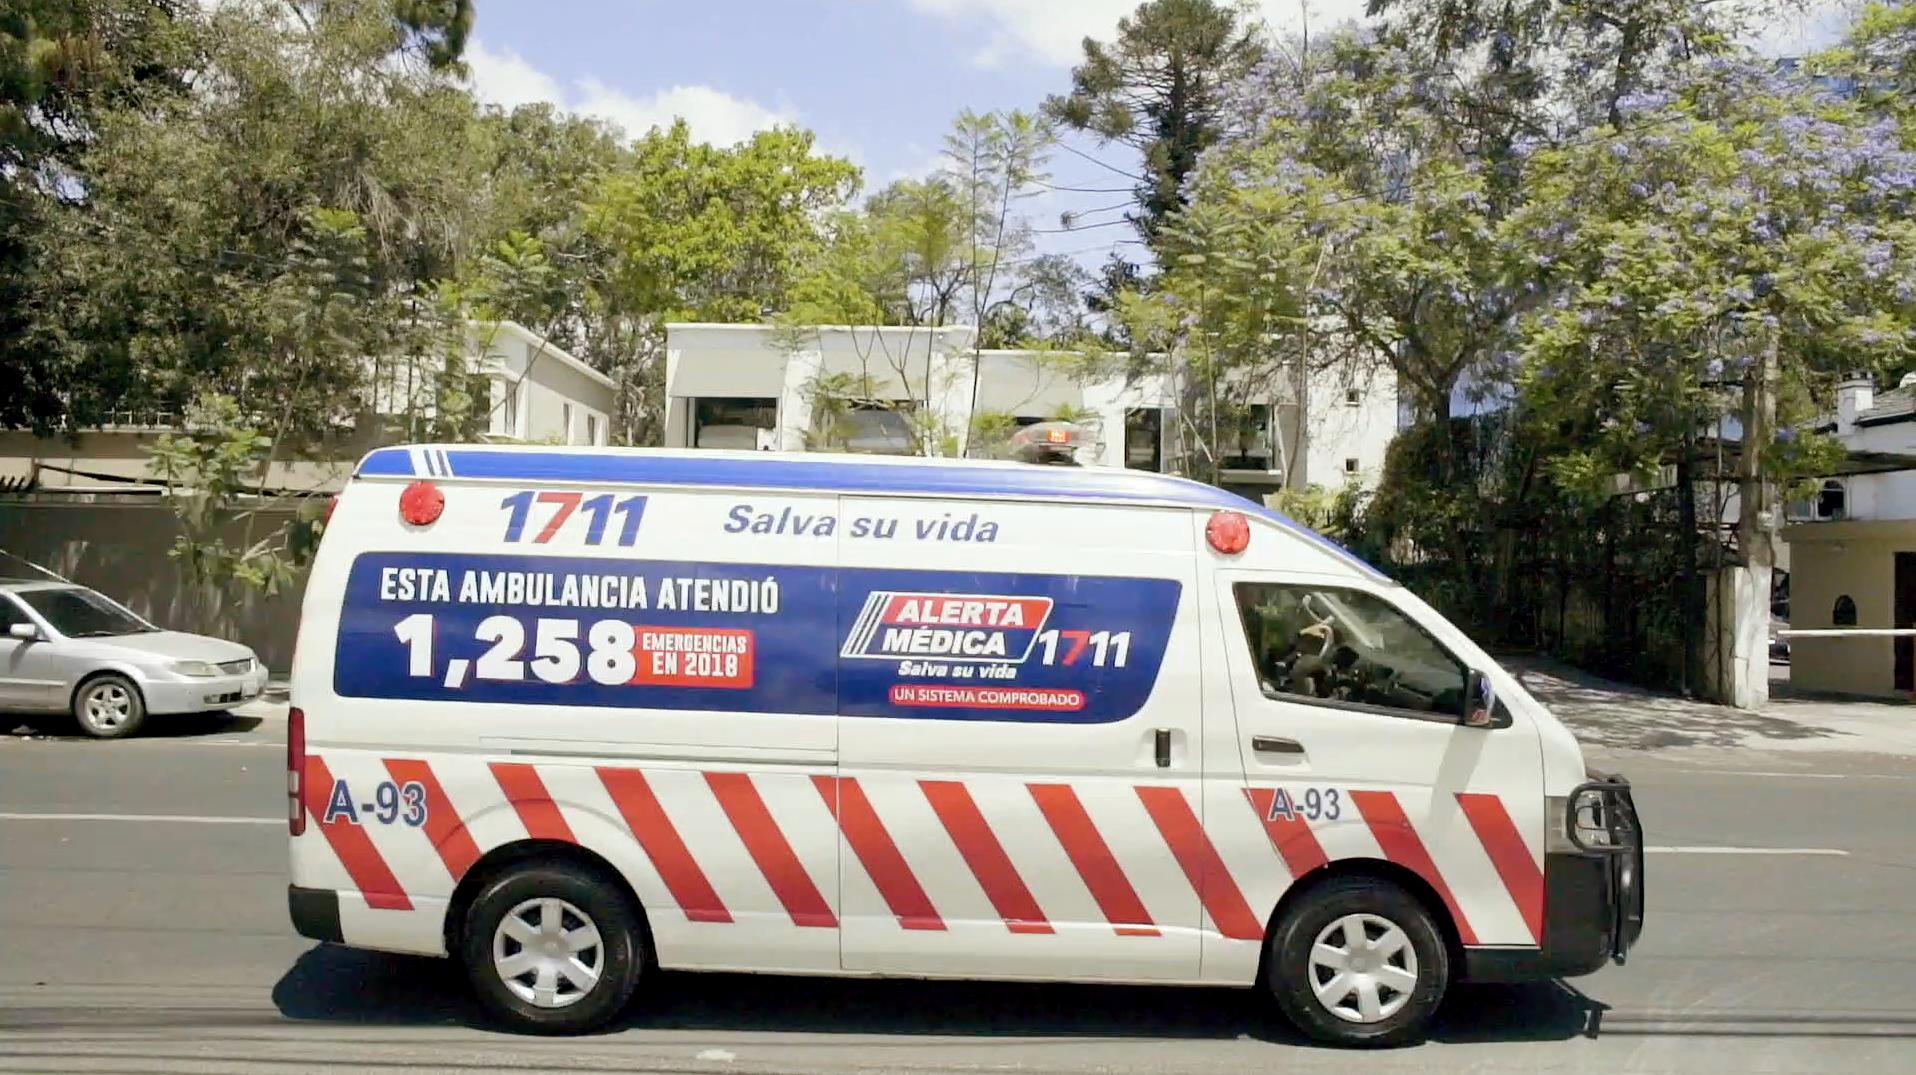 DALE PASO A LA AMBULANCIA ALERTA MEDICA BANCO INDUSTRIAL